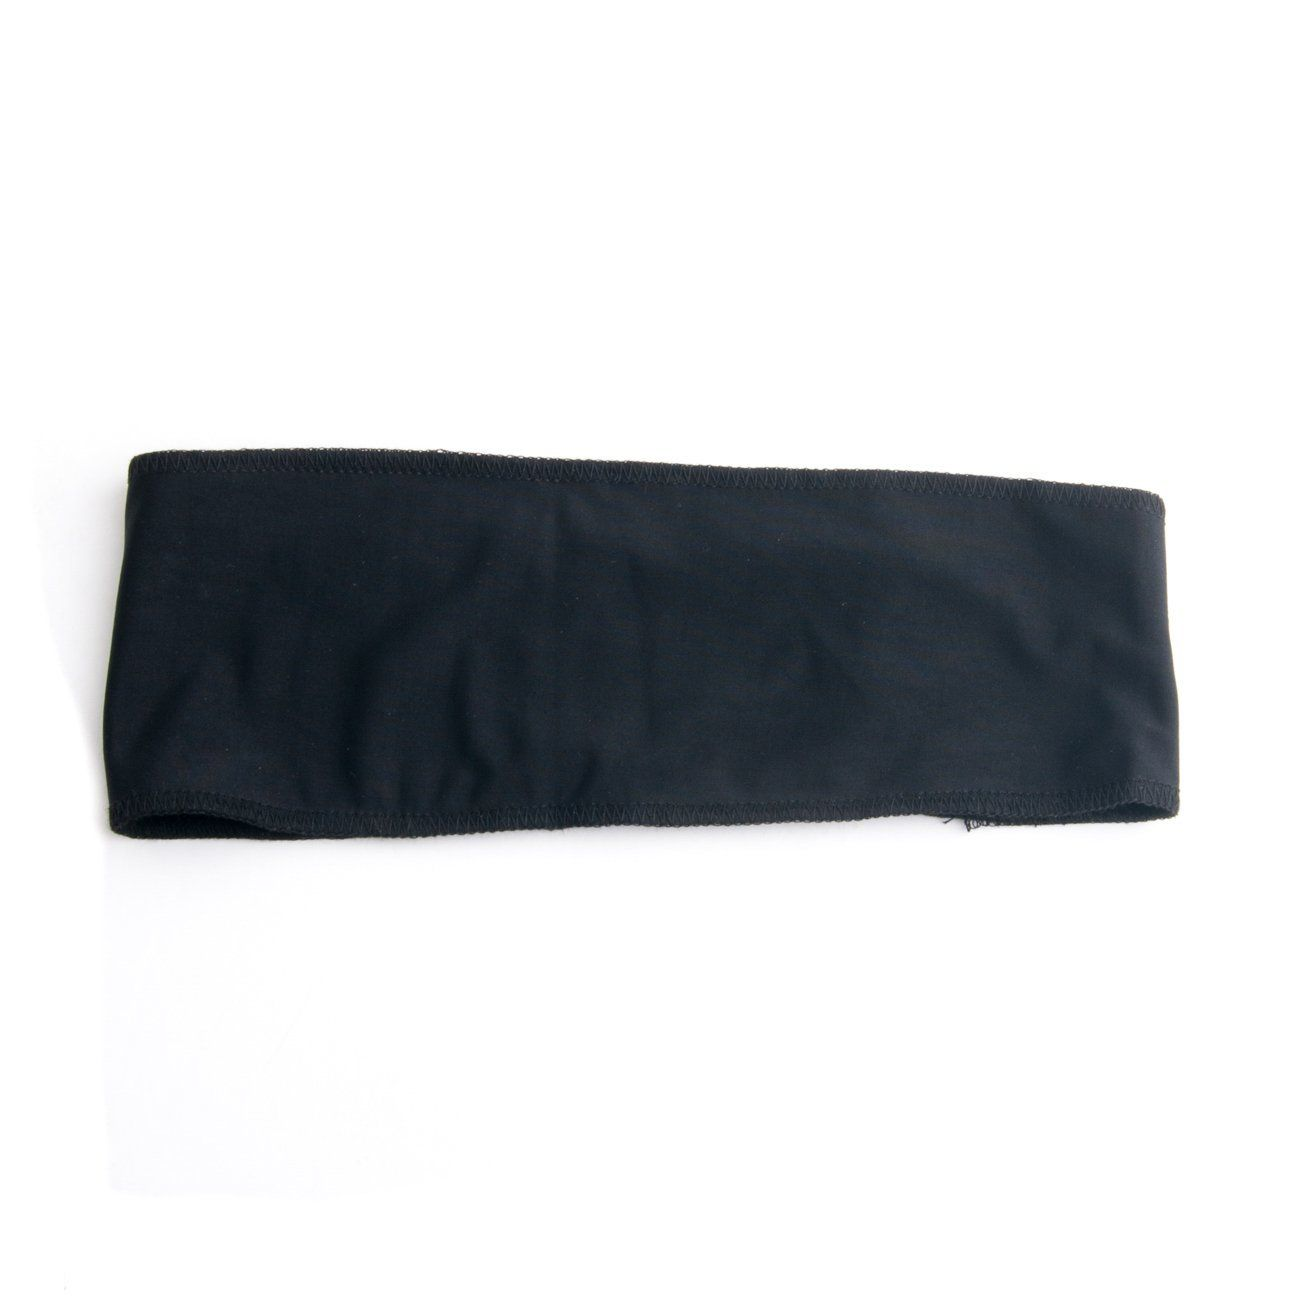 Dri sweat edge edge active wear headband click image